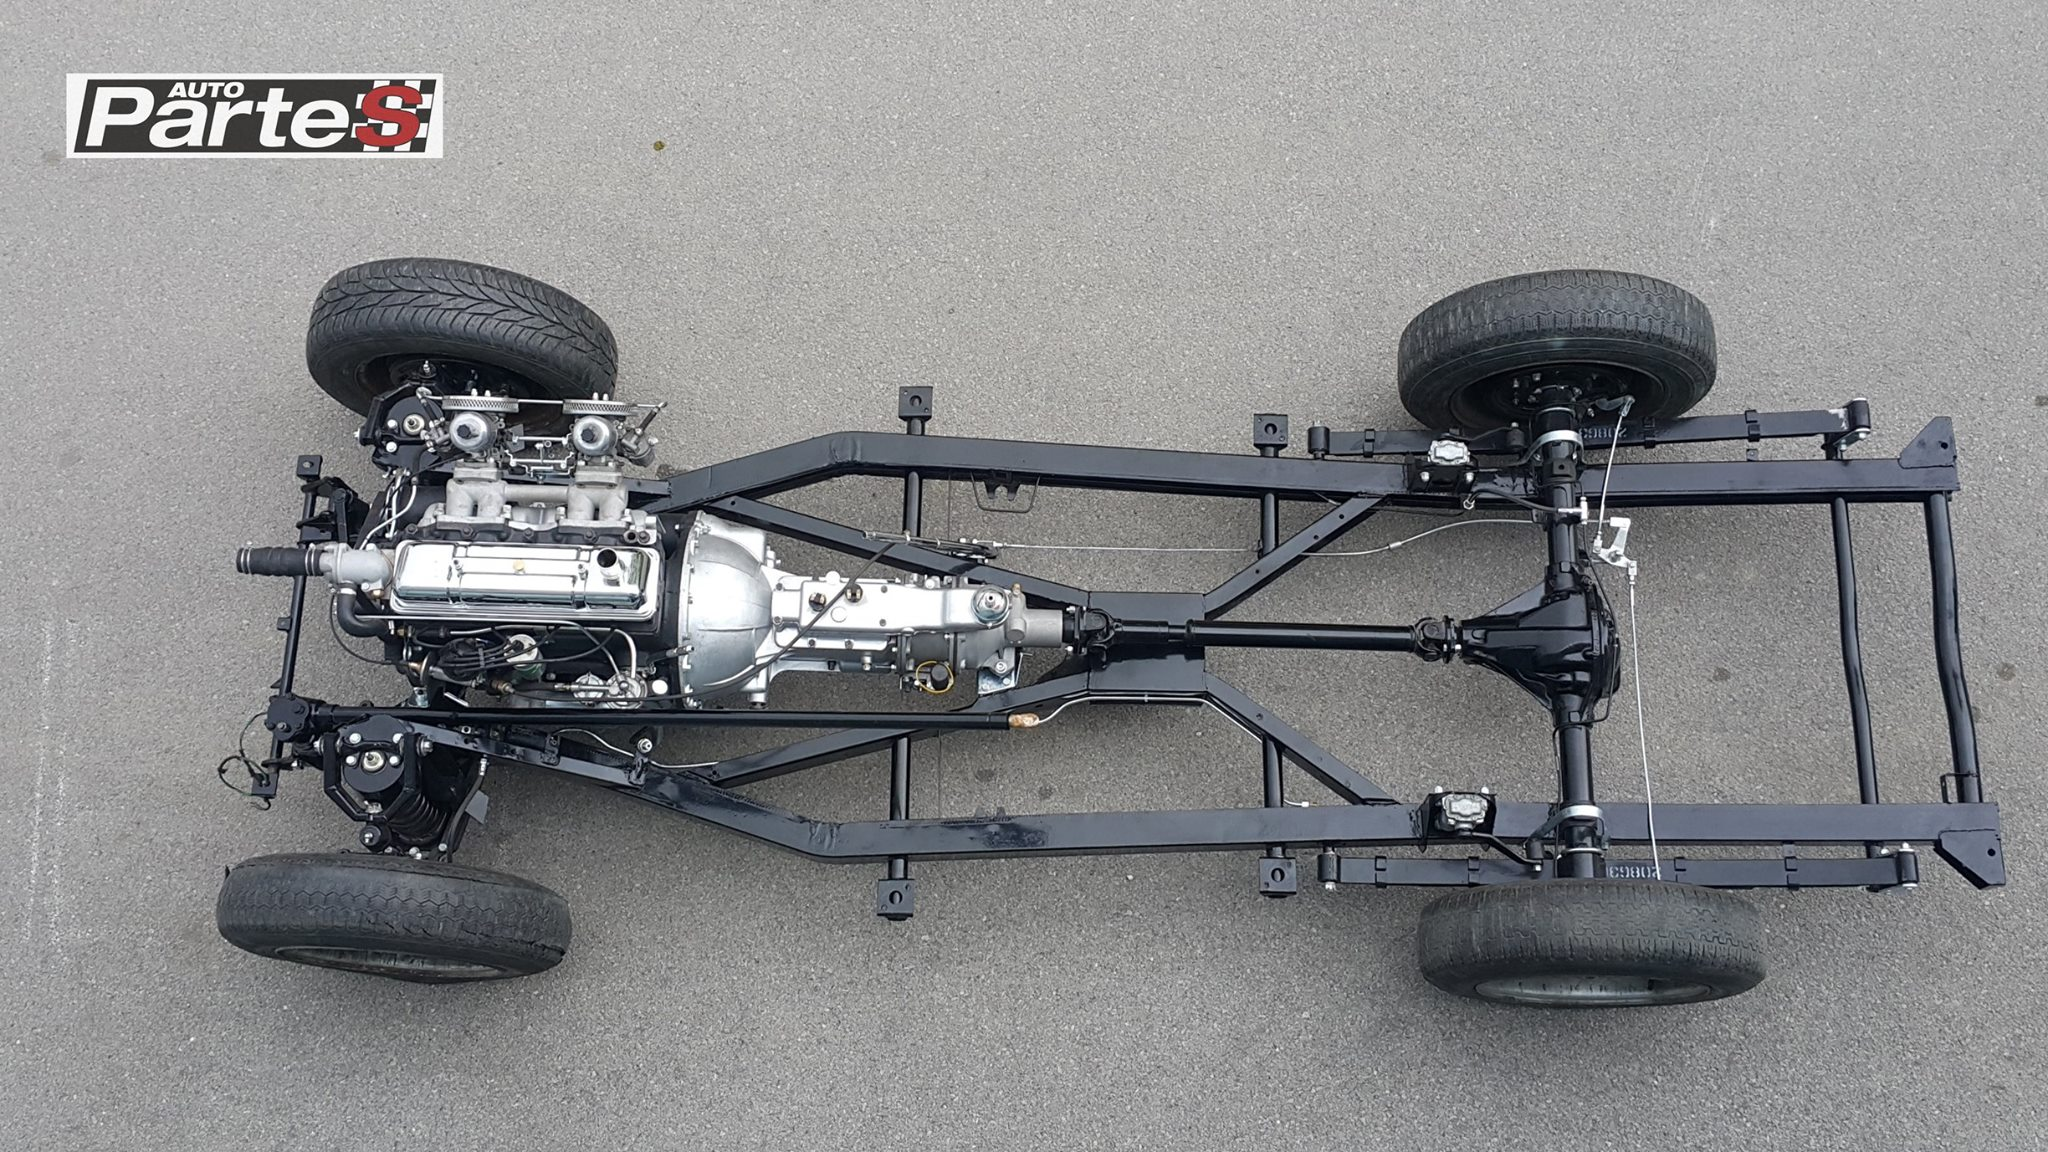 Superior Auto Parts >> Triumph TR2 better than new after epic restoration - Dandy Classics